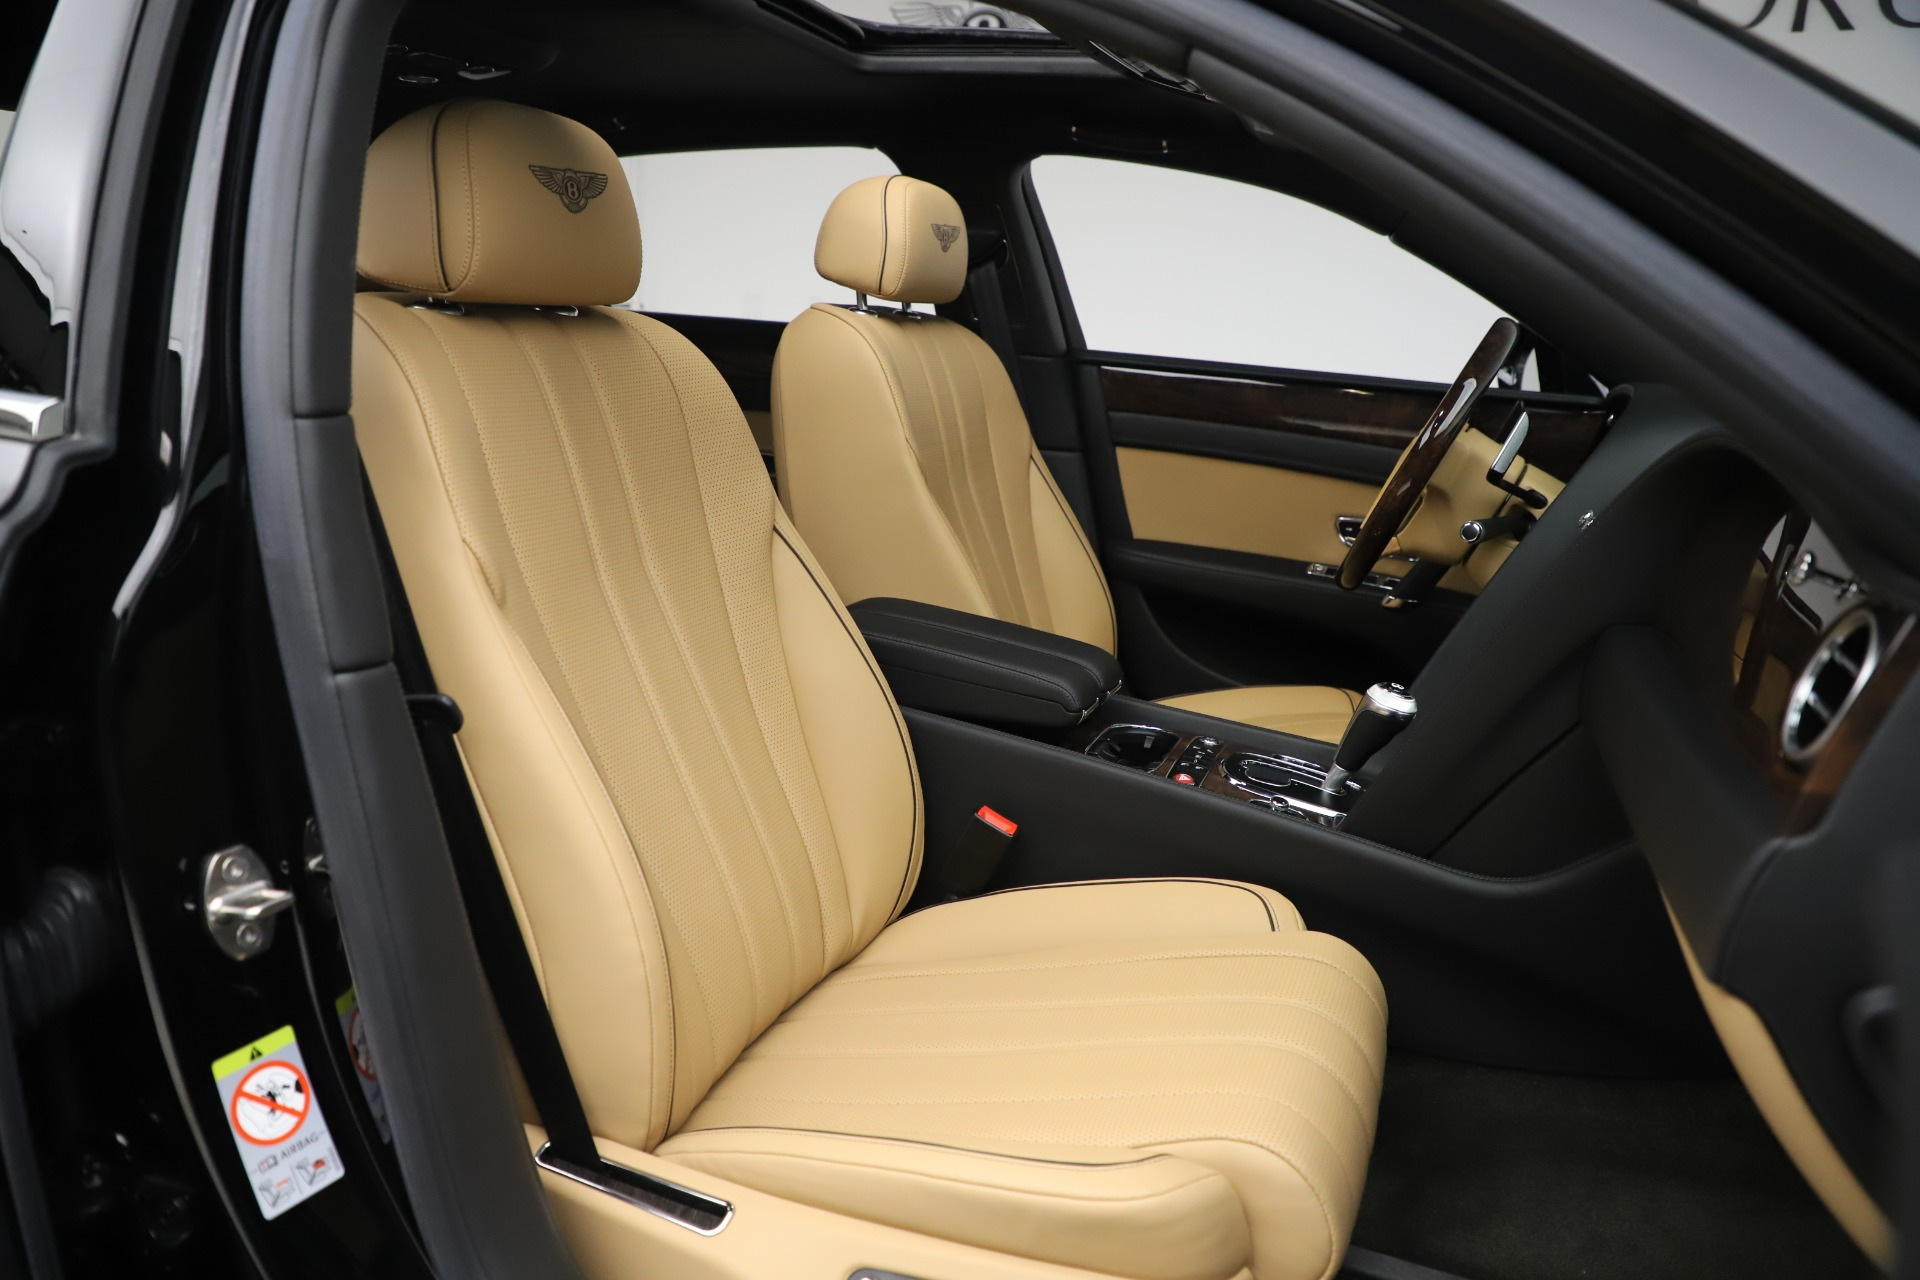 Used 2016 Bentley Flying Spur V8 For Sale In Westport, CT 3526_p26